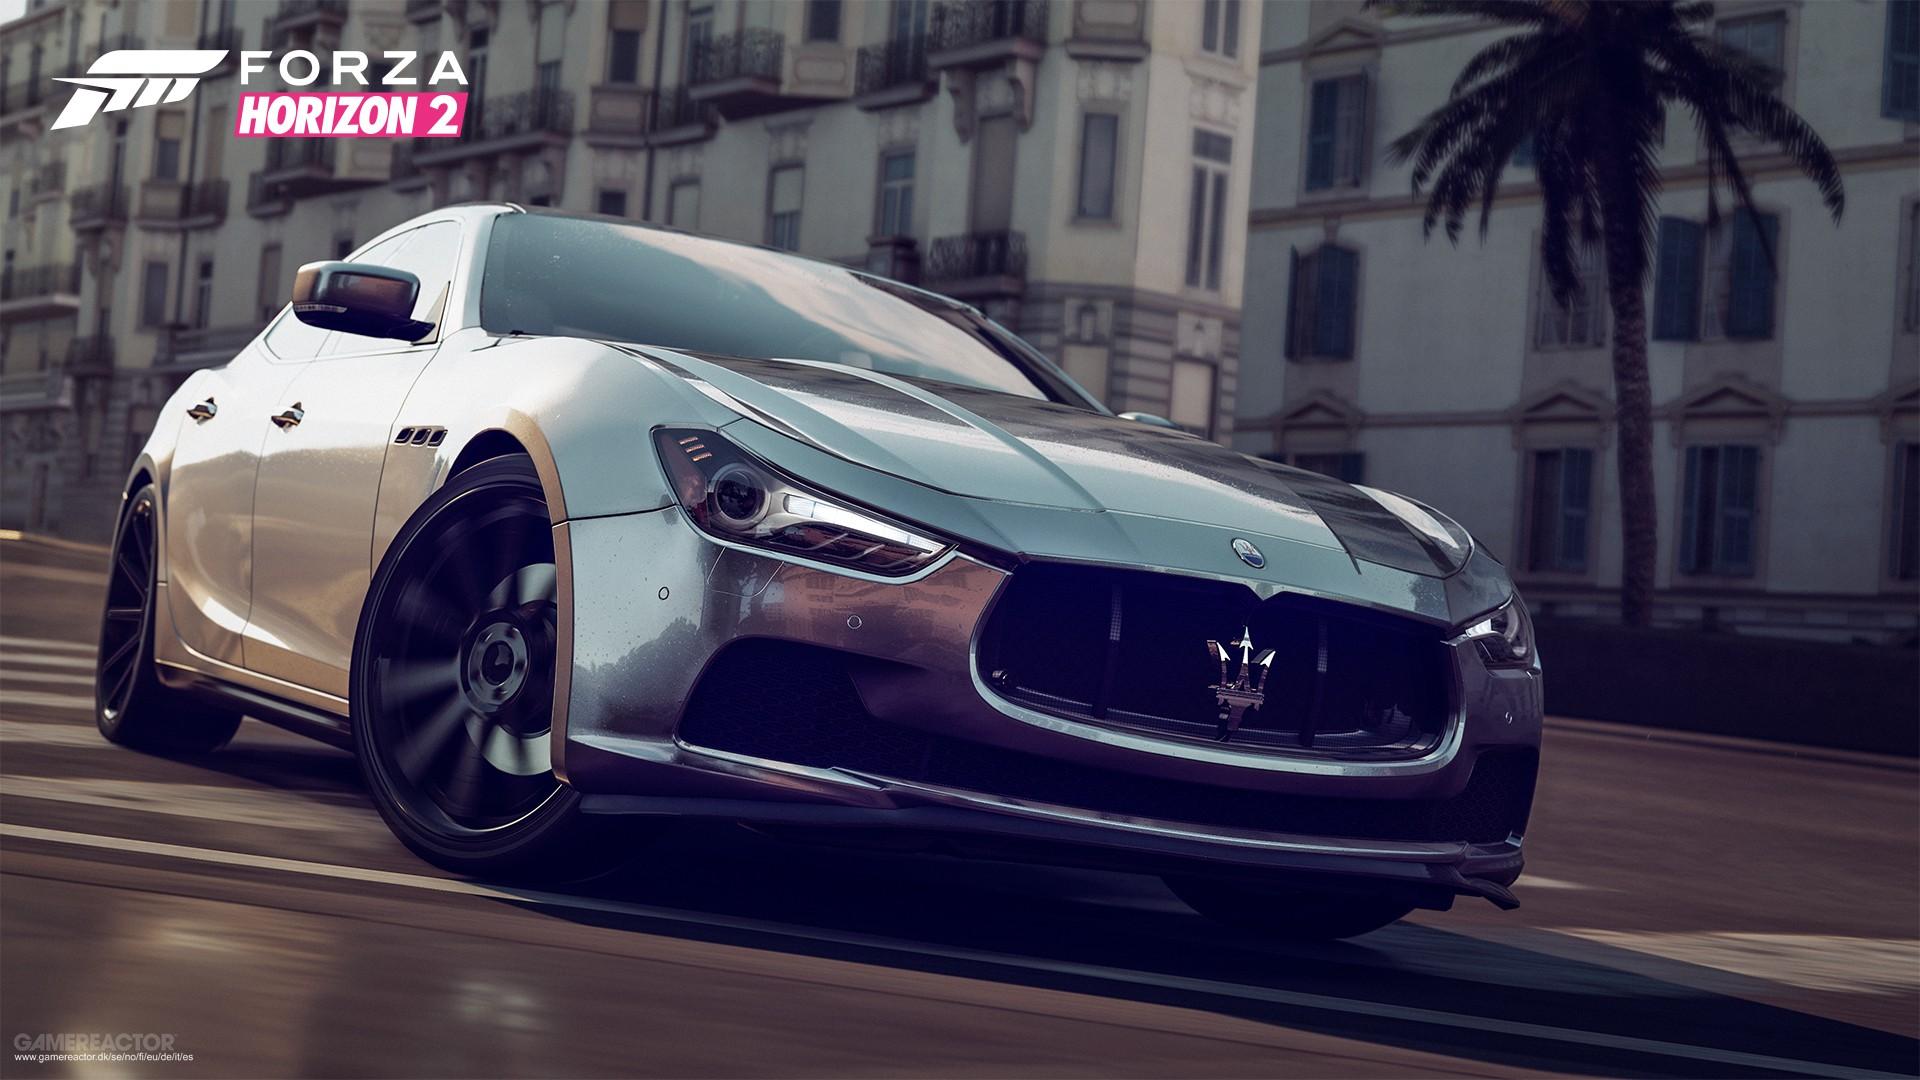 All Furious 7 Cars As Forza Horizon 2 DLC